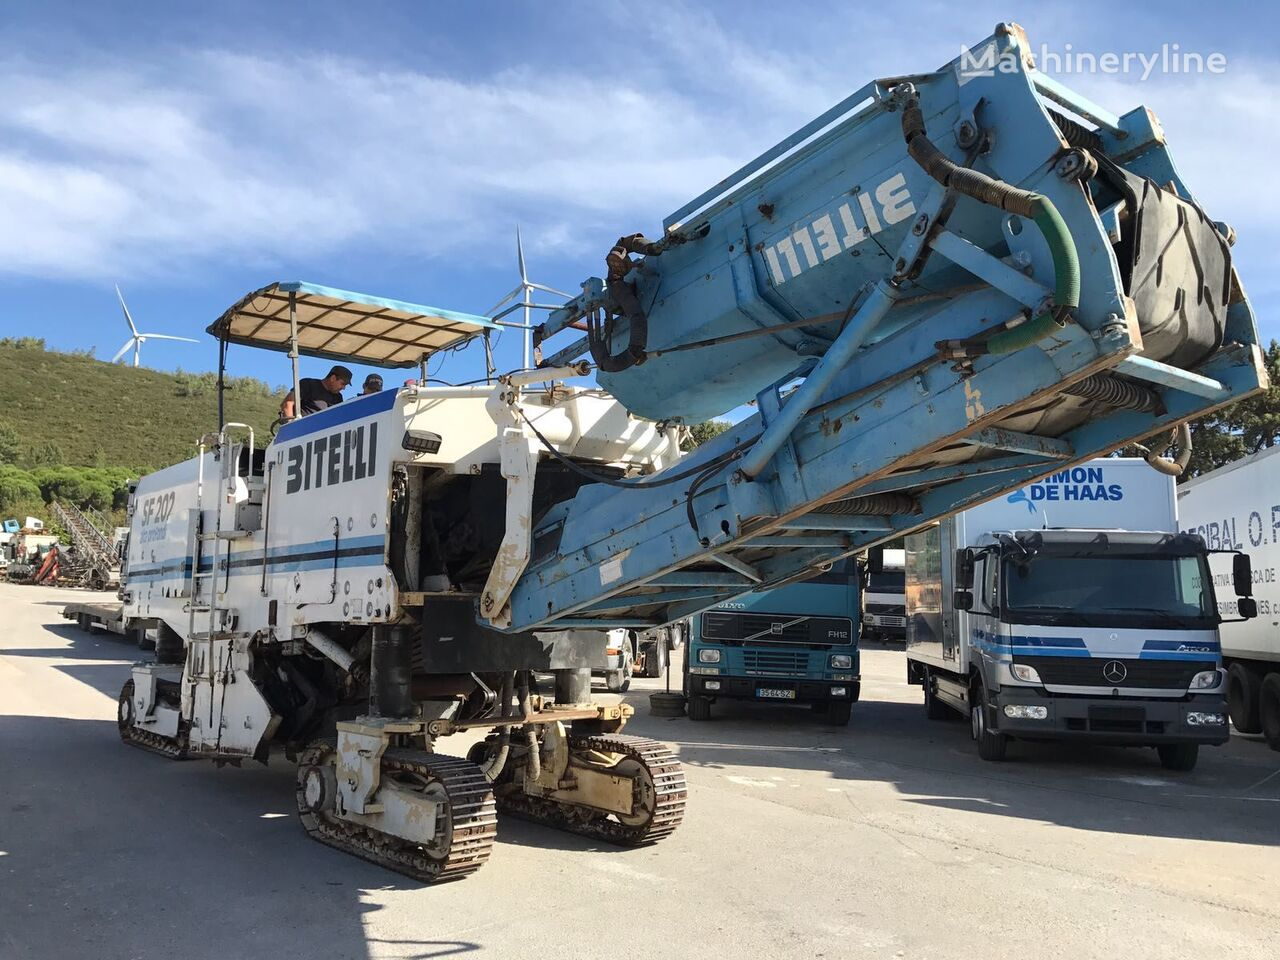 дорожная фреза BITELLI SF 202 R - COLD PLANNER / ROAD CUTTER / ASPHALT MILLING MACHINE